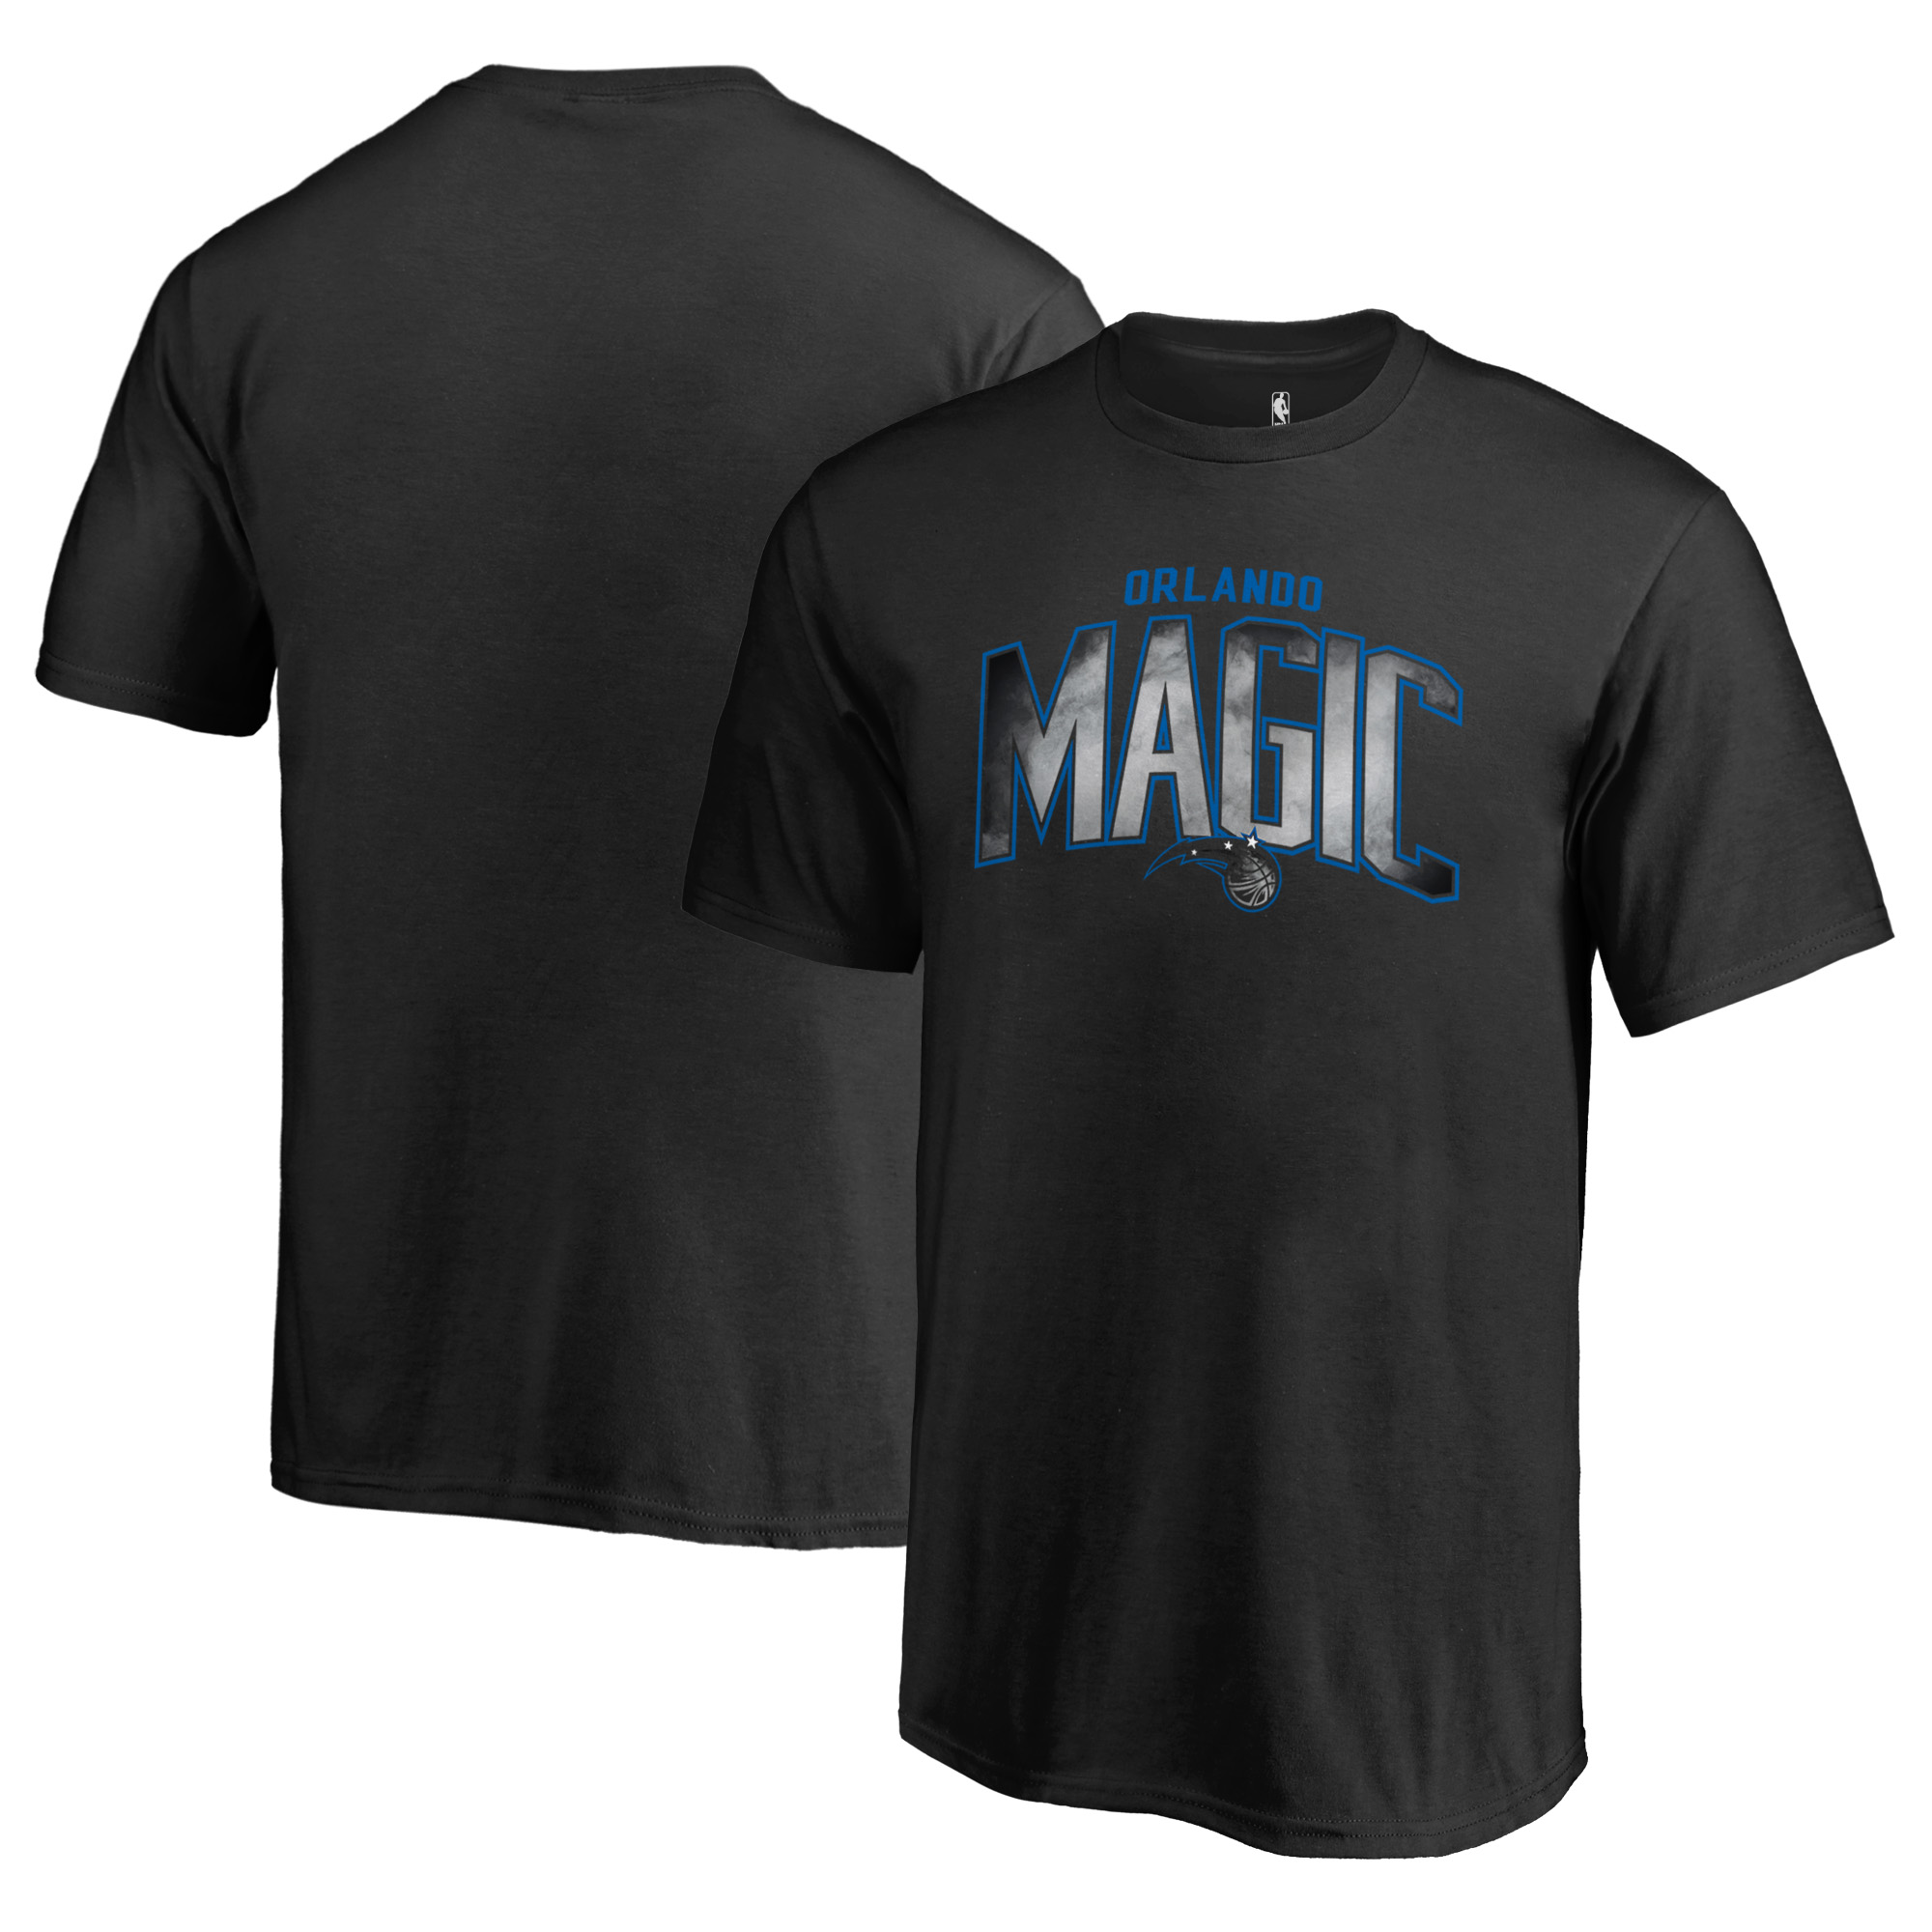 Orlando Magic Fanatics Branded Youth Arch Smoke T-Shirt - Black